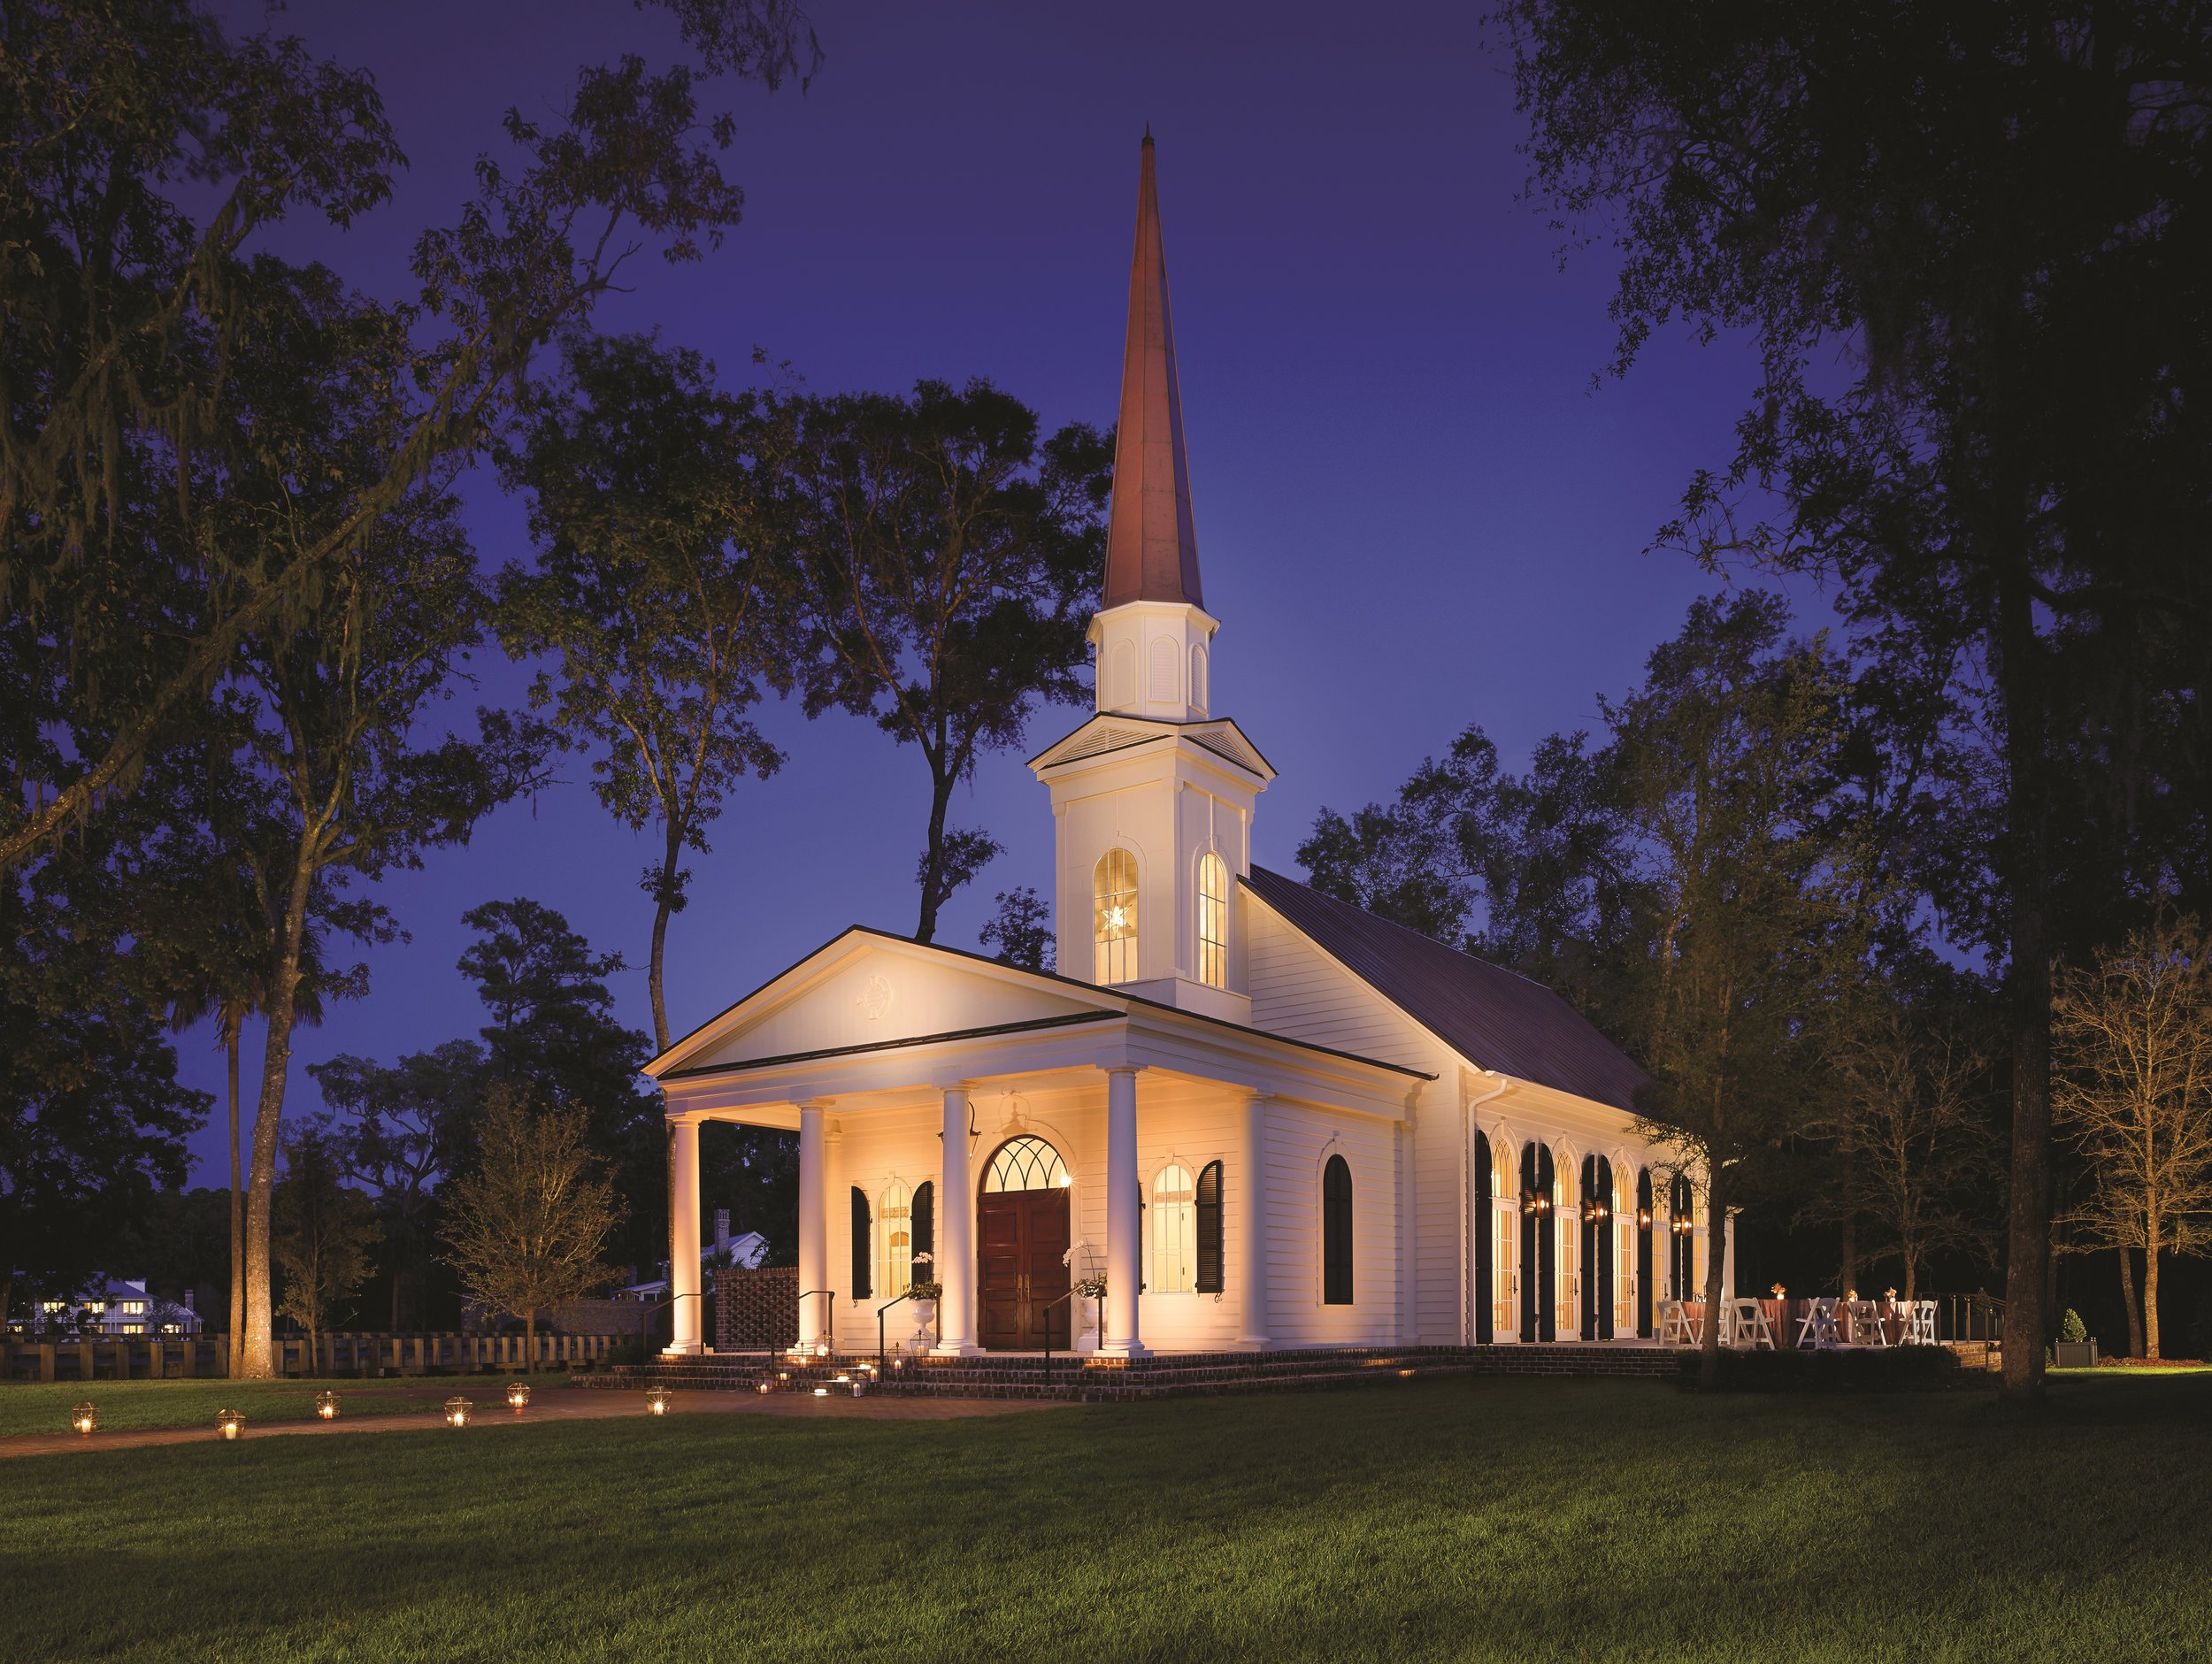 MPB-Architectural-Sommerset Chapel Ext Night-CMYK.jpg